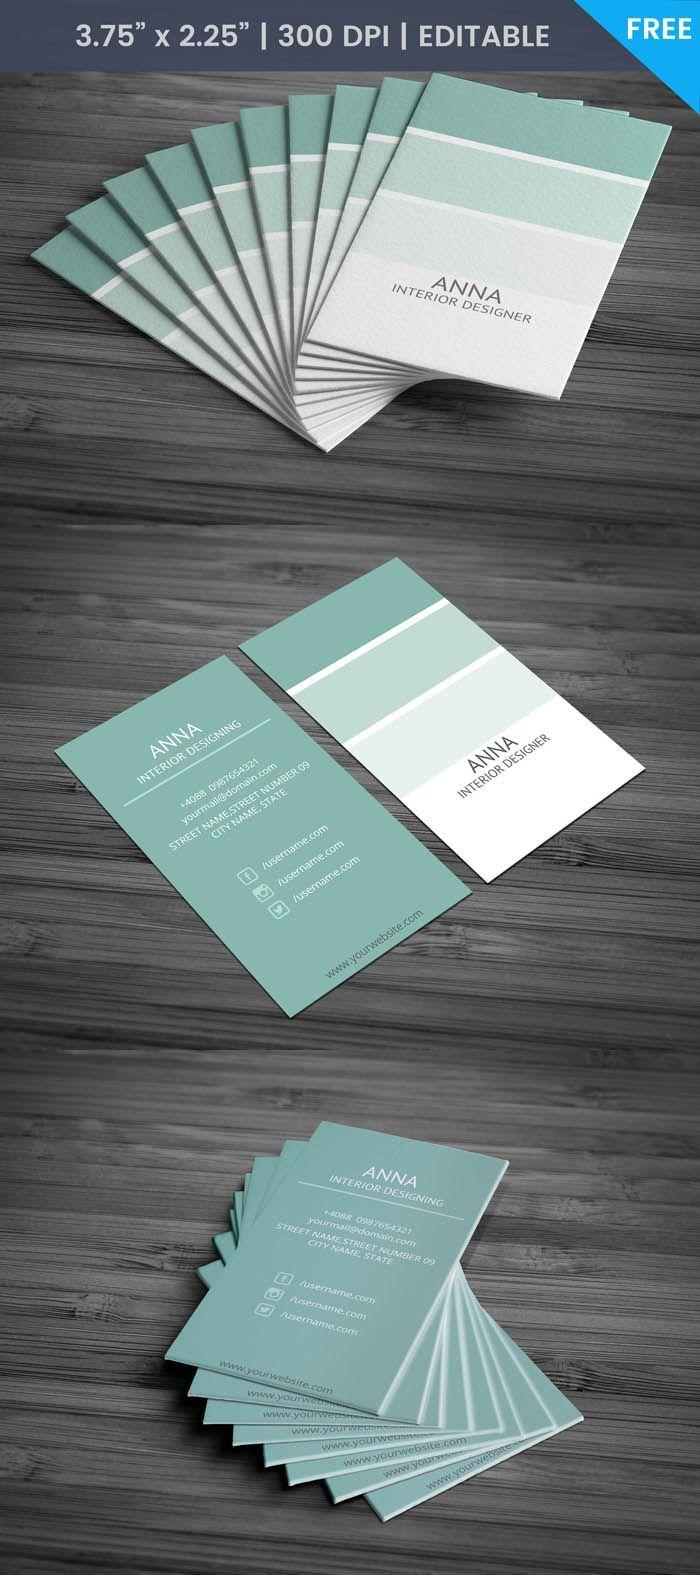 Free Interior Designer Business Card Template Freeinteriordesign Interior Designer Business Card Business Card Design Free Business Card Templates